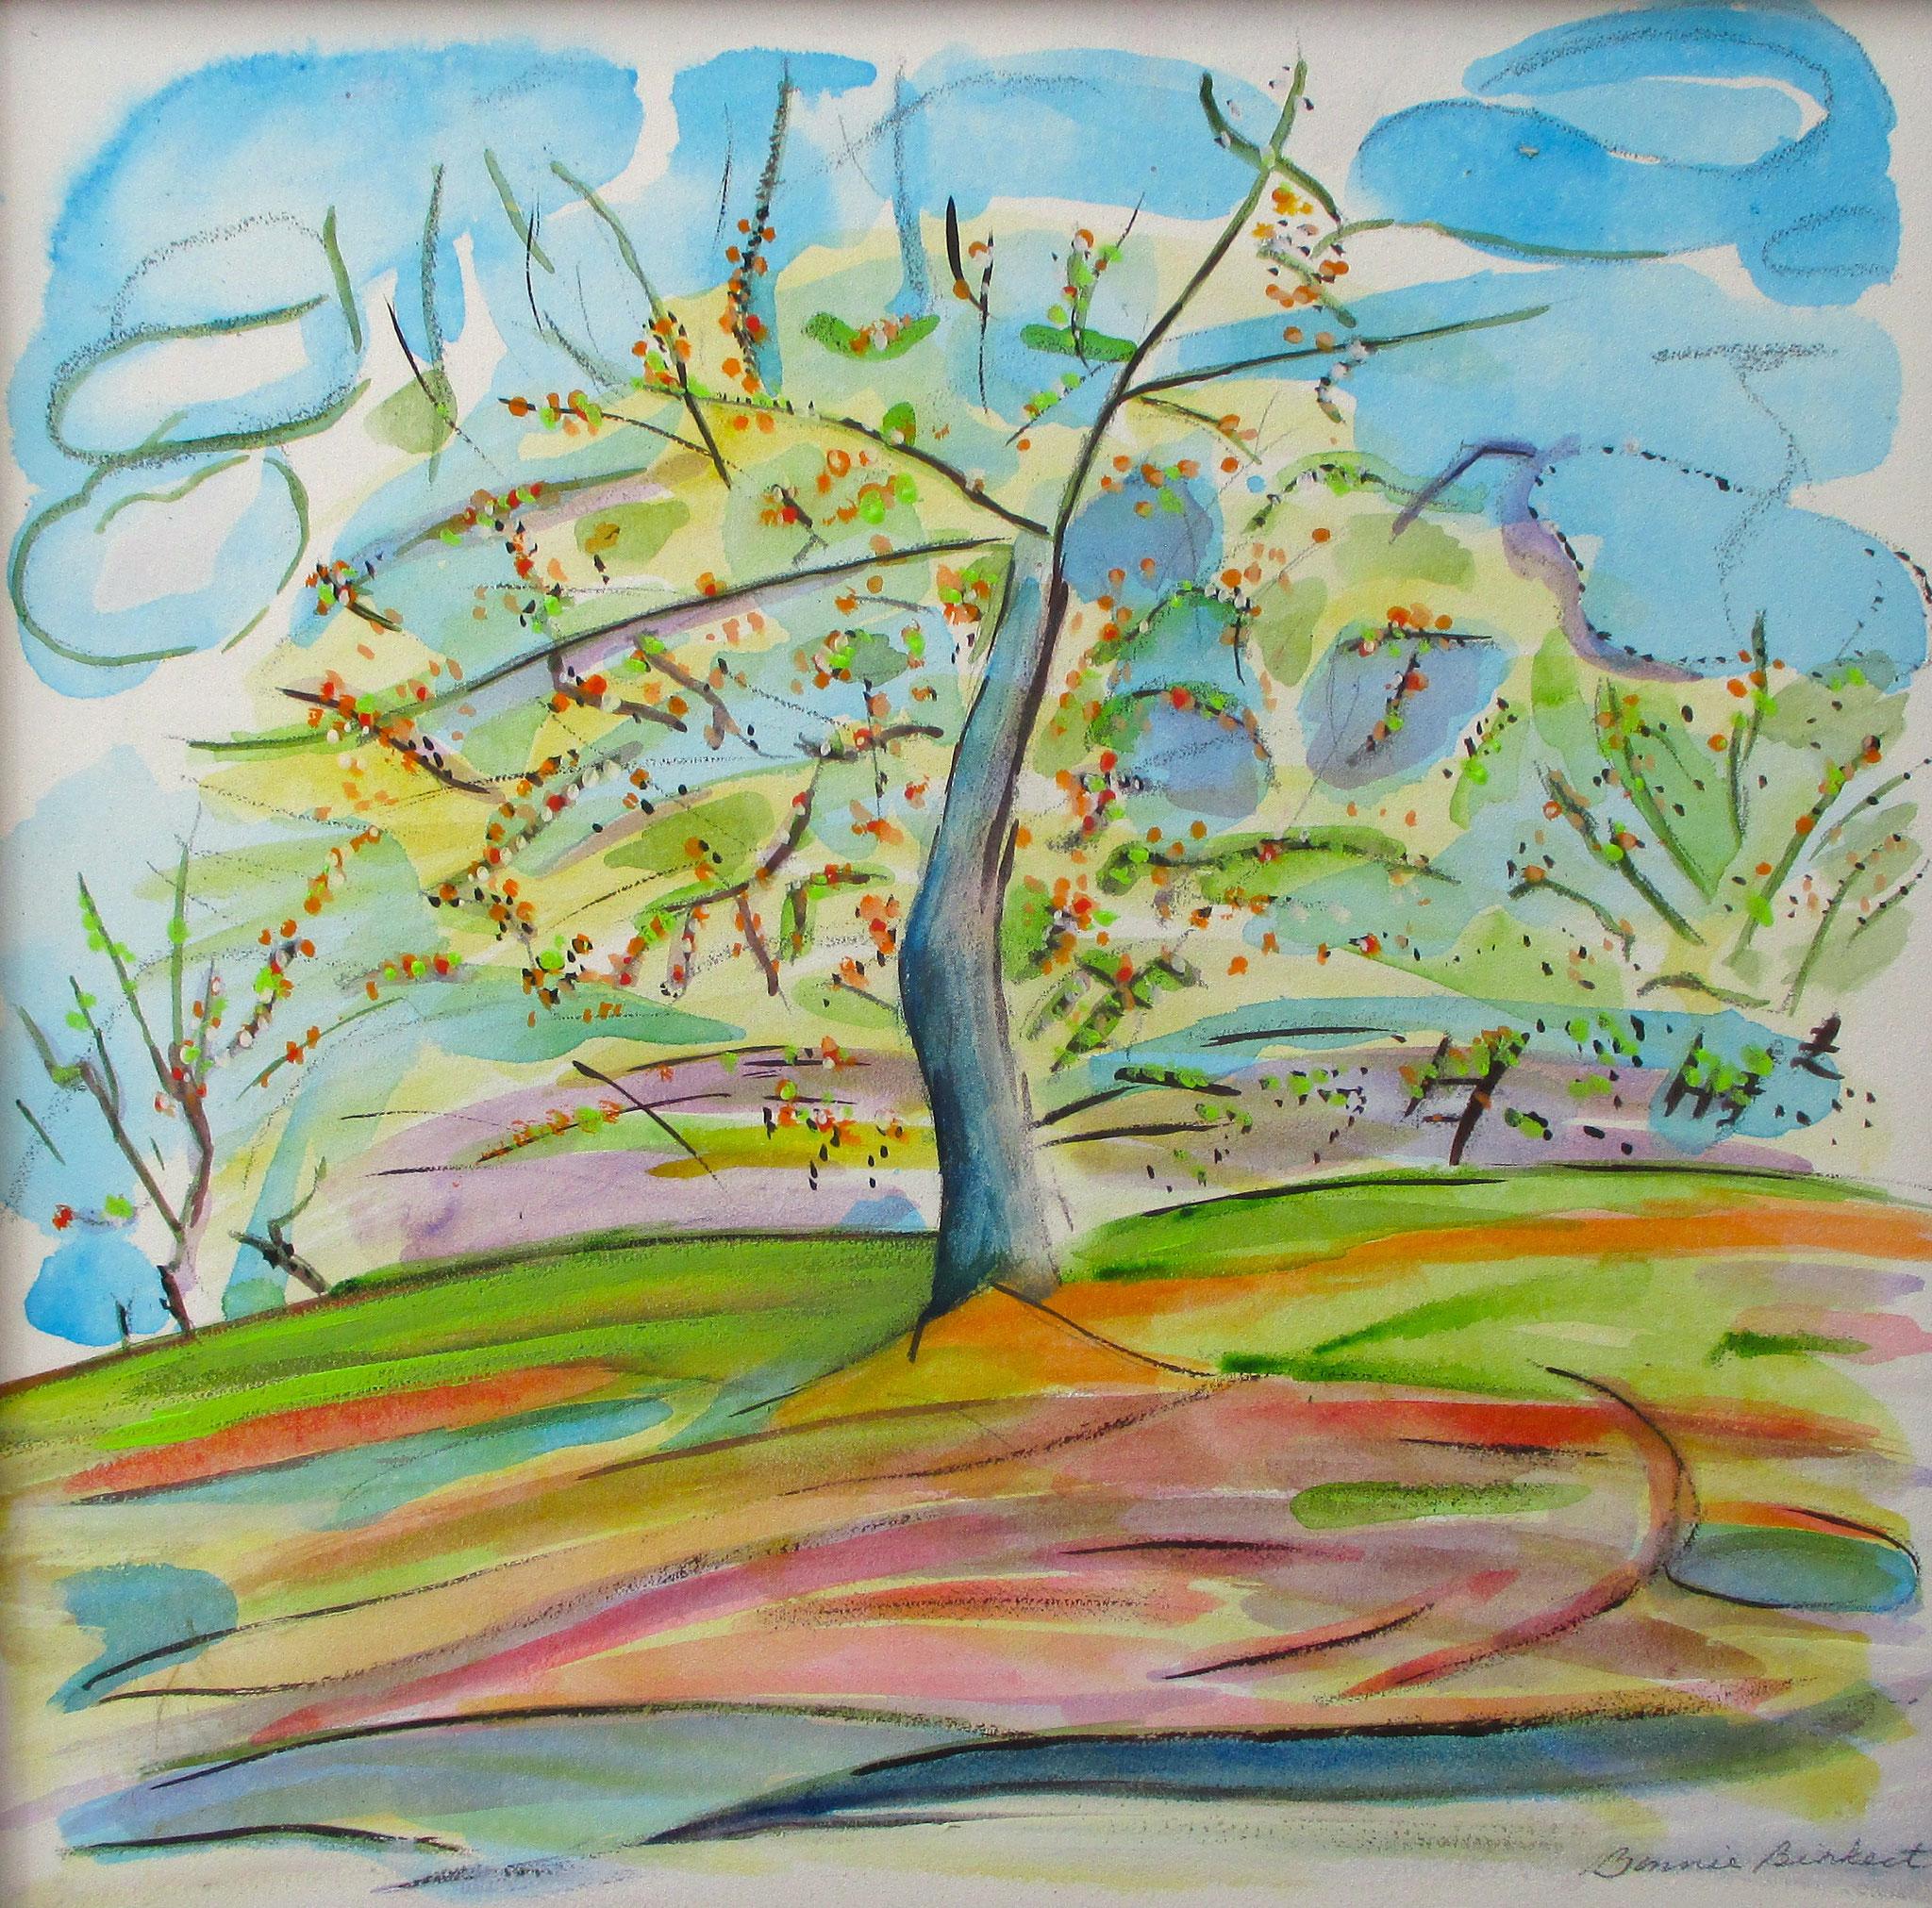 Apricot Season, watercolor on board, 12 x 12, SOLD